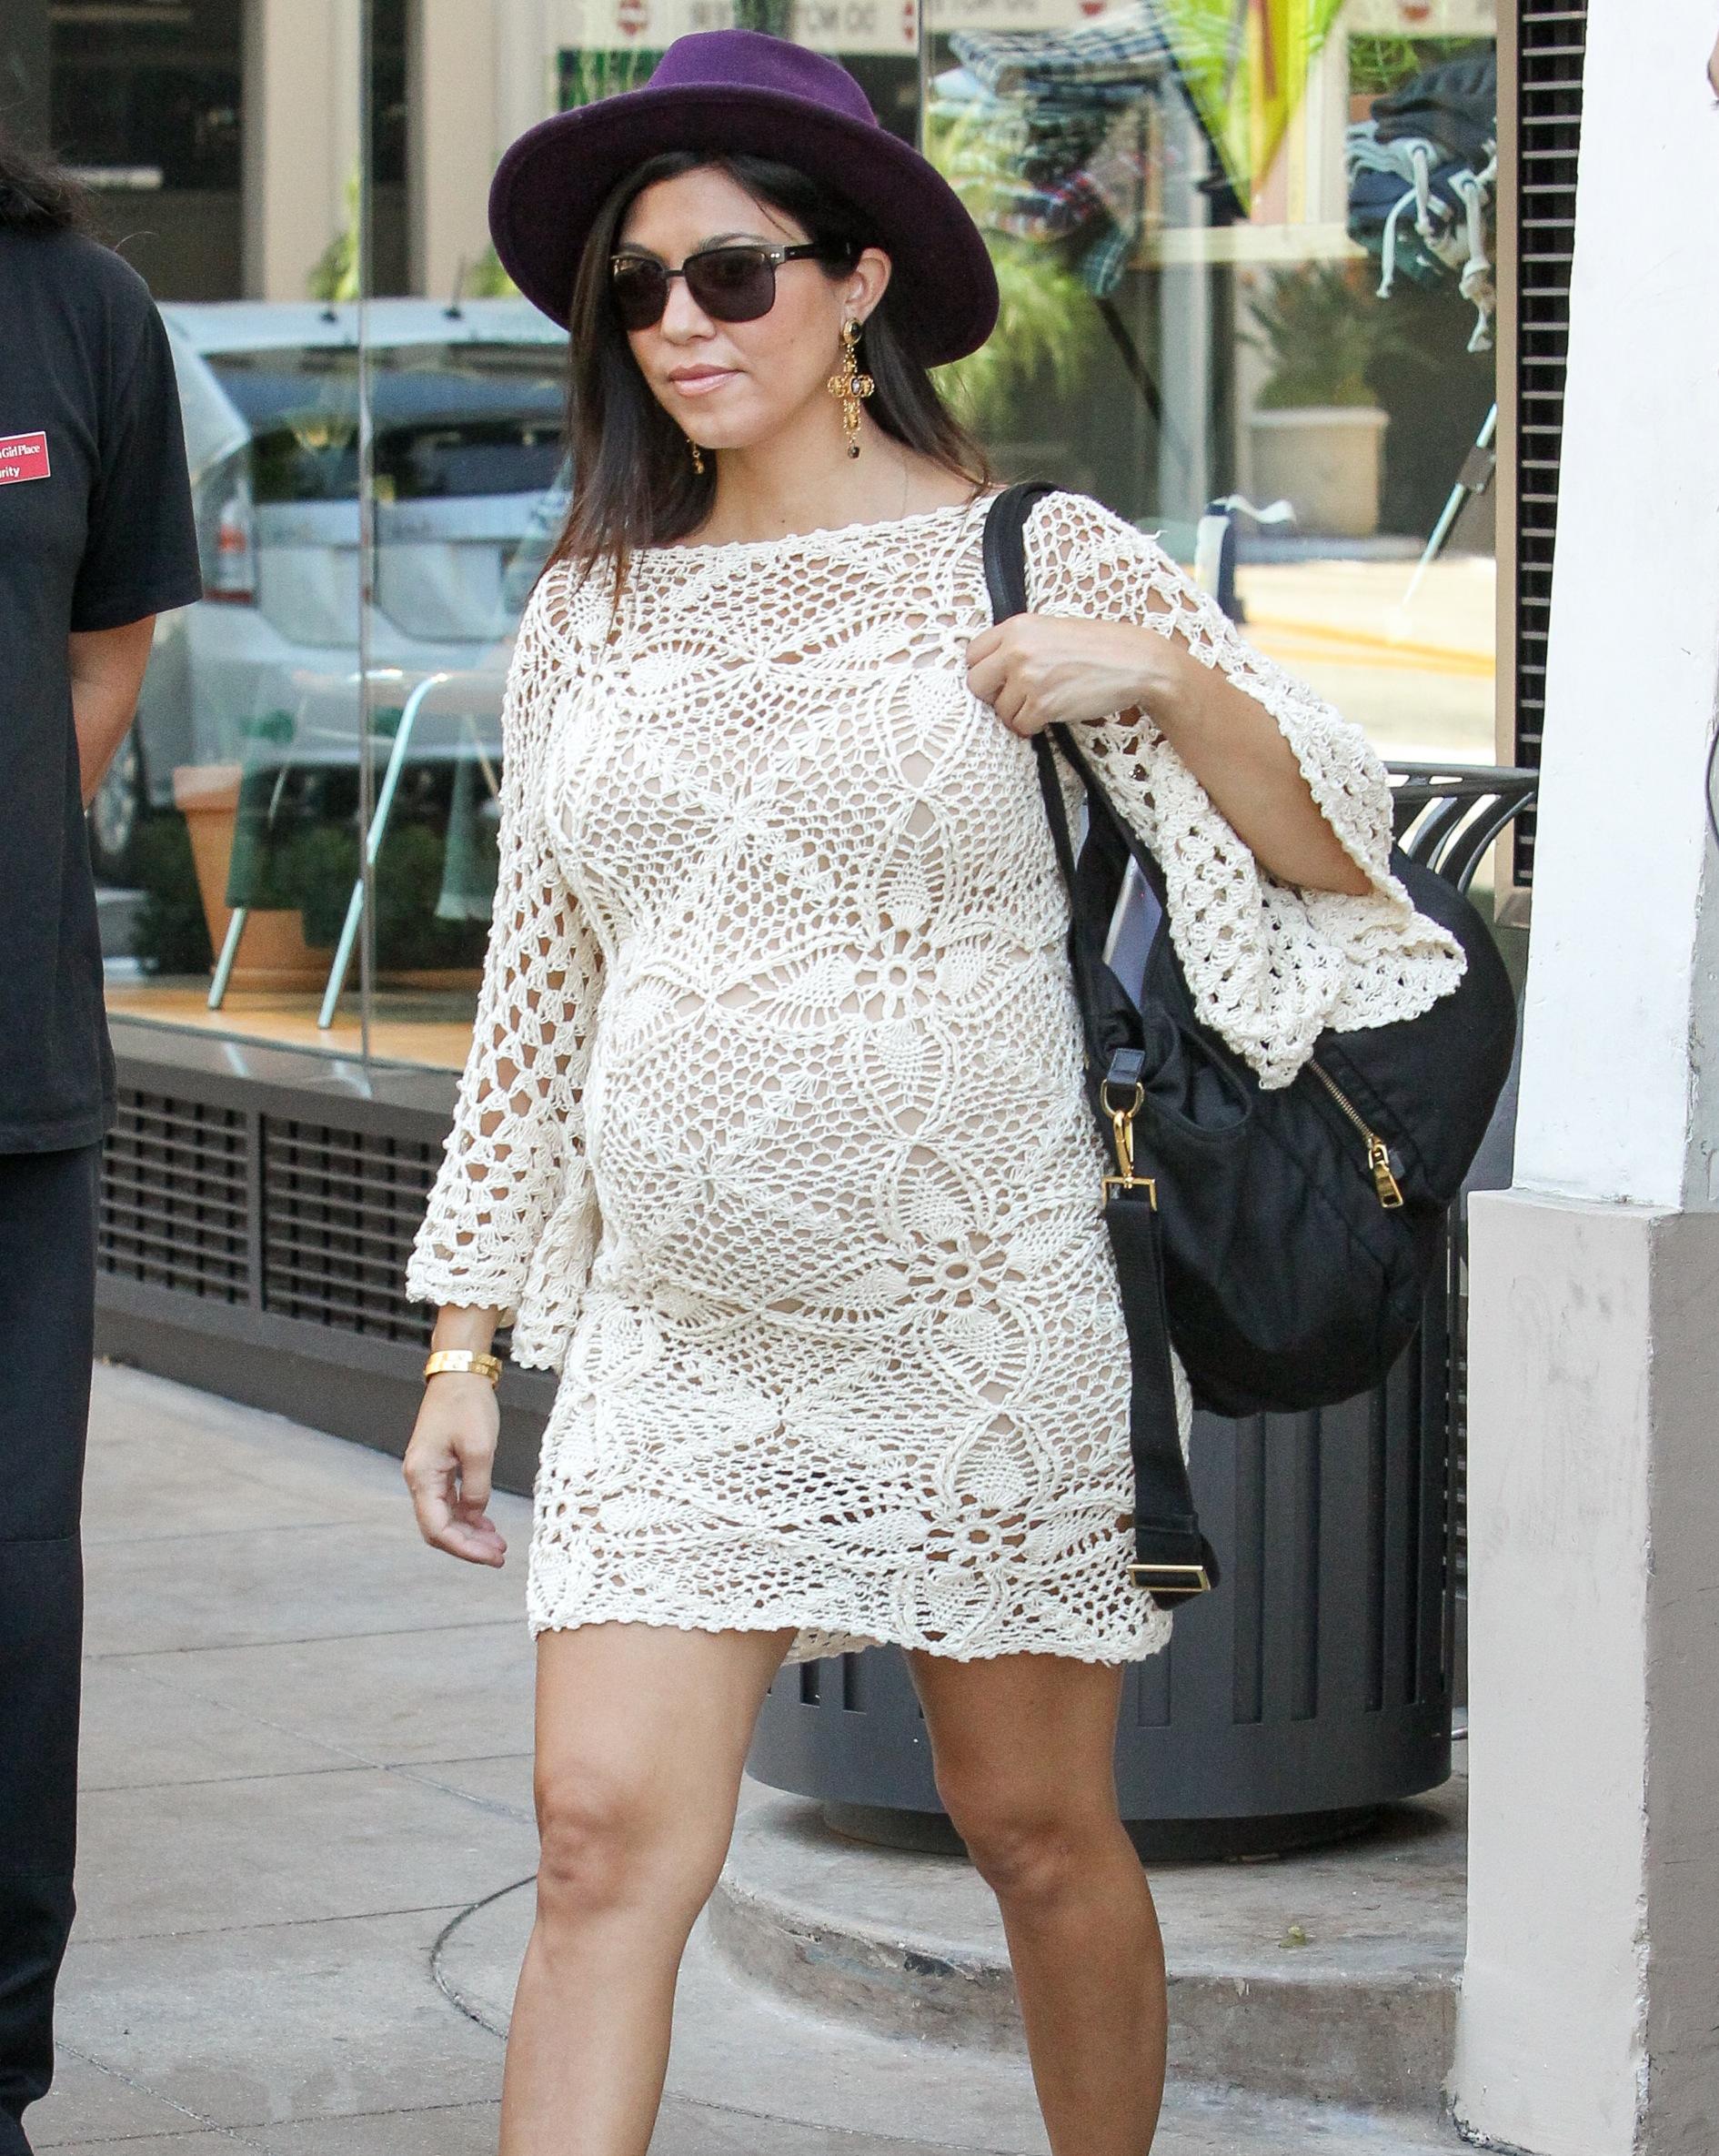 aedf7af431f23 Pregnant Kourtney Kardashian Shows Off Her Tiny Baby Bump on ...